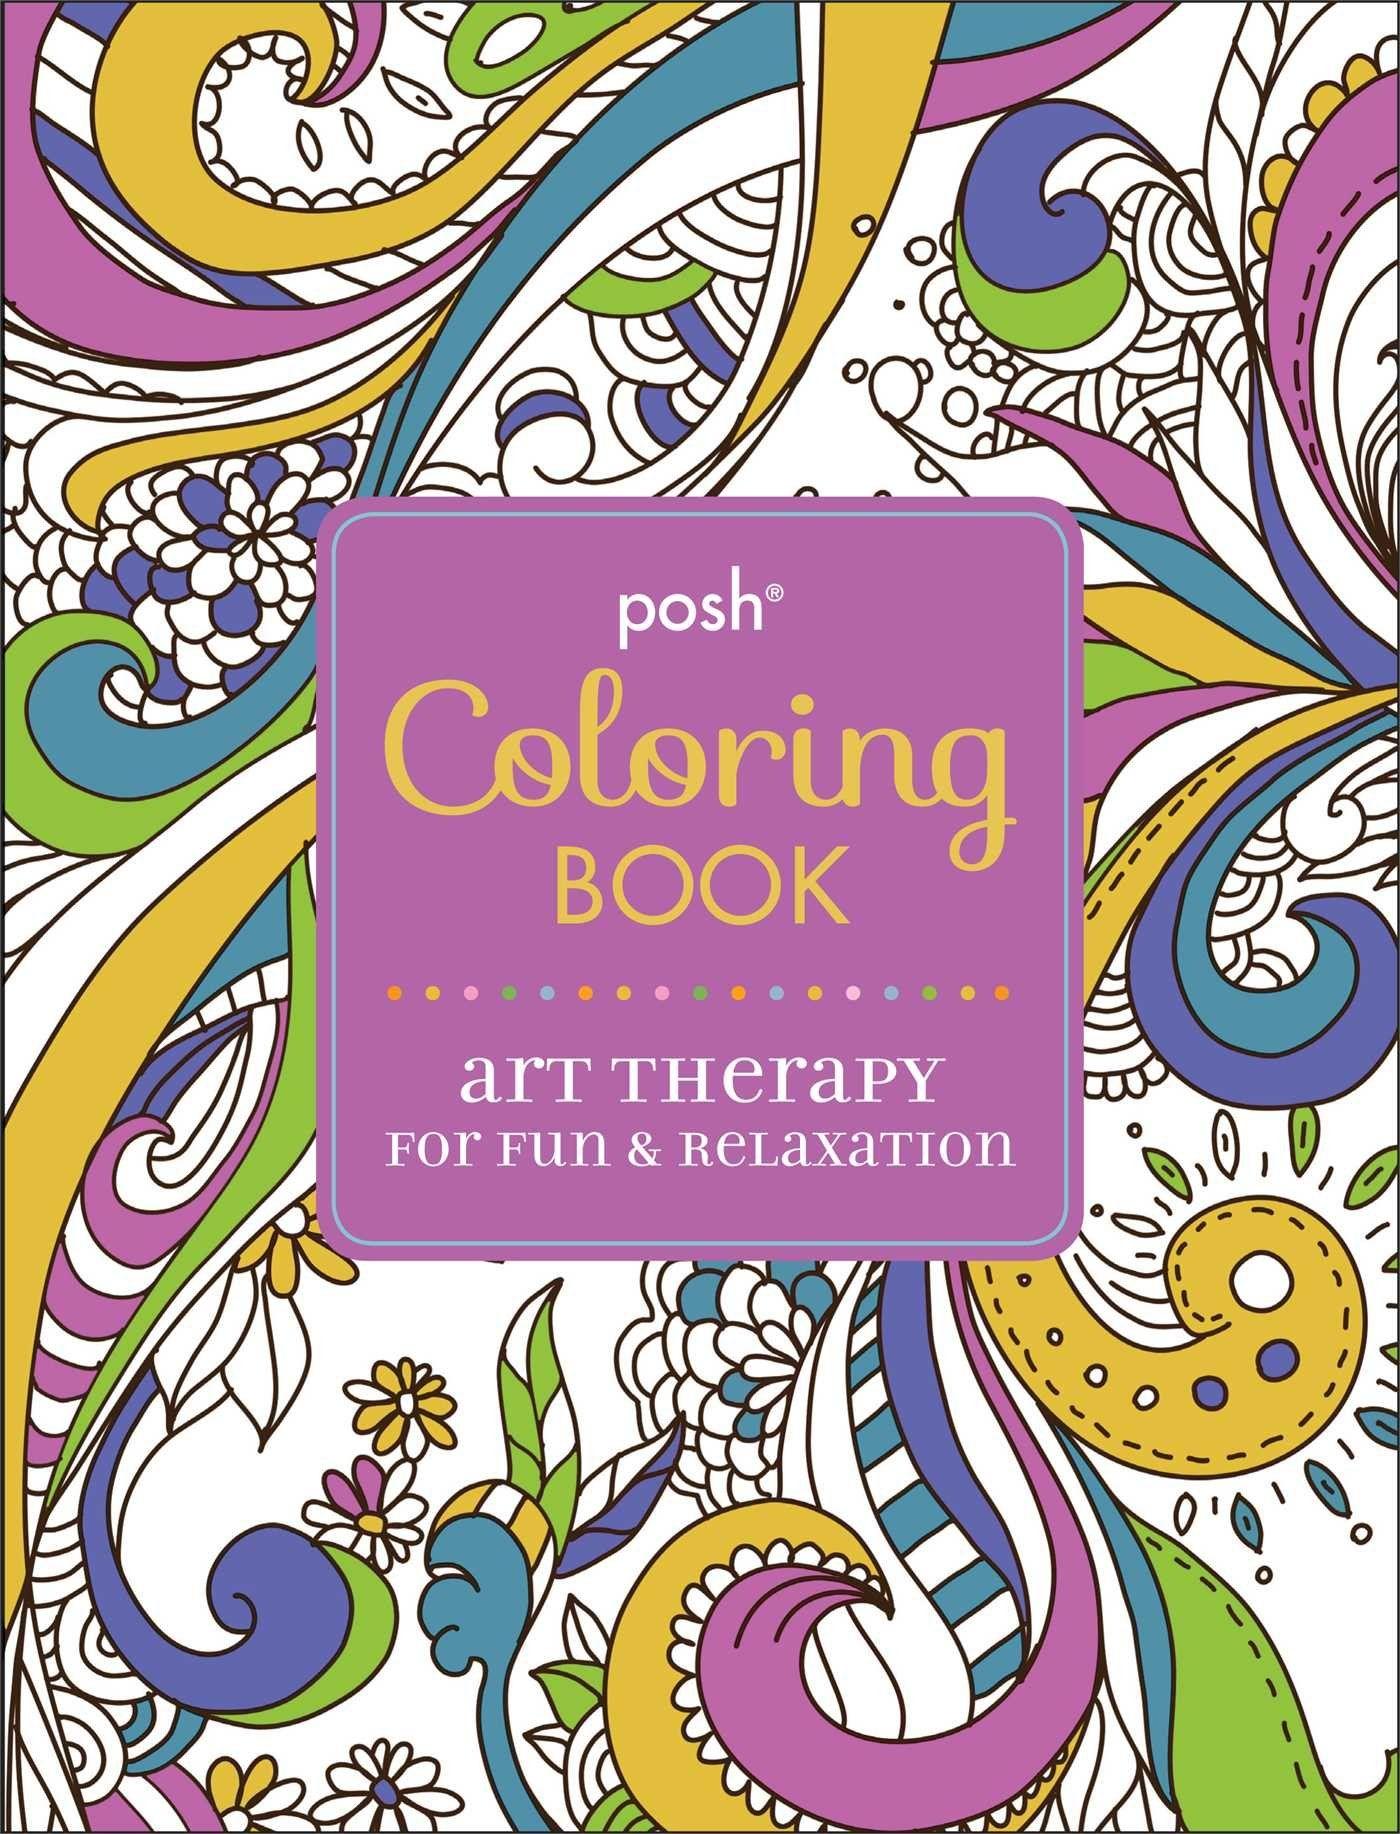 Posh Coloring Book Art Therapy For Fun Relaxation Michael OMara Books Ltd 9781449458775 Amazon